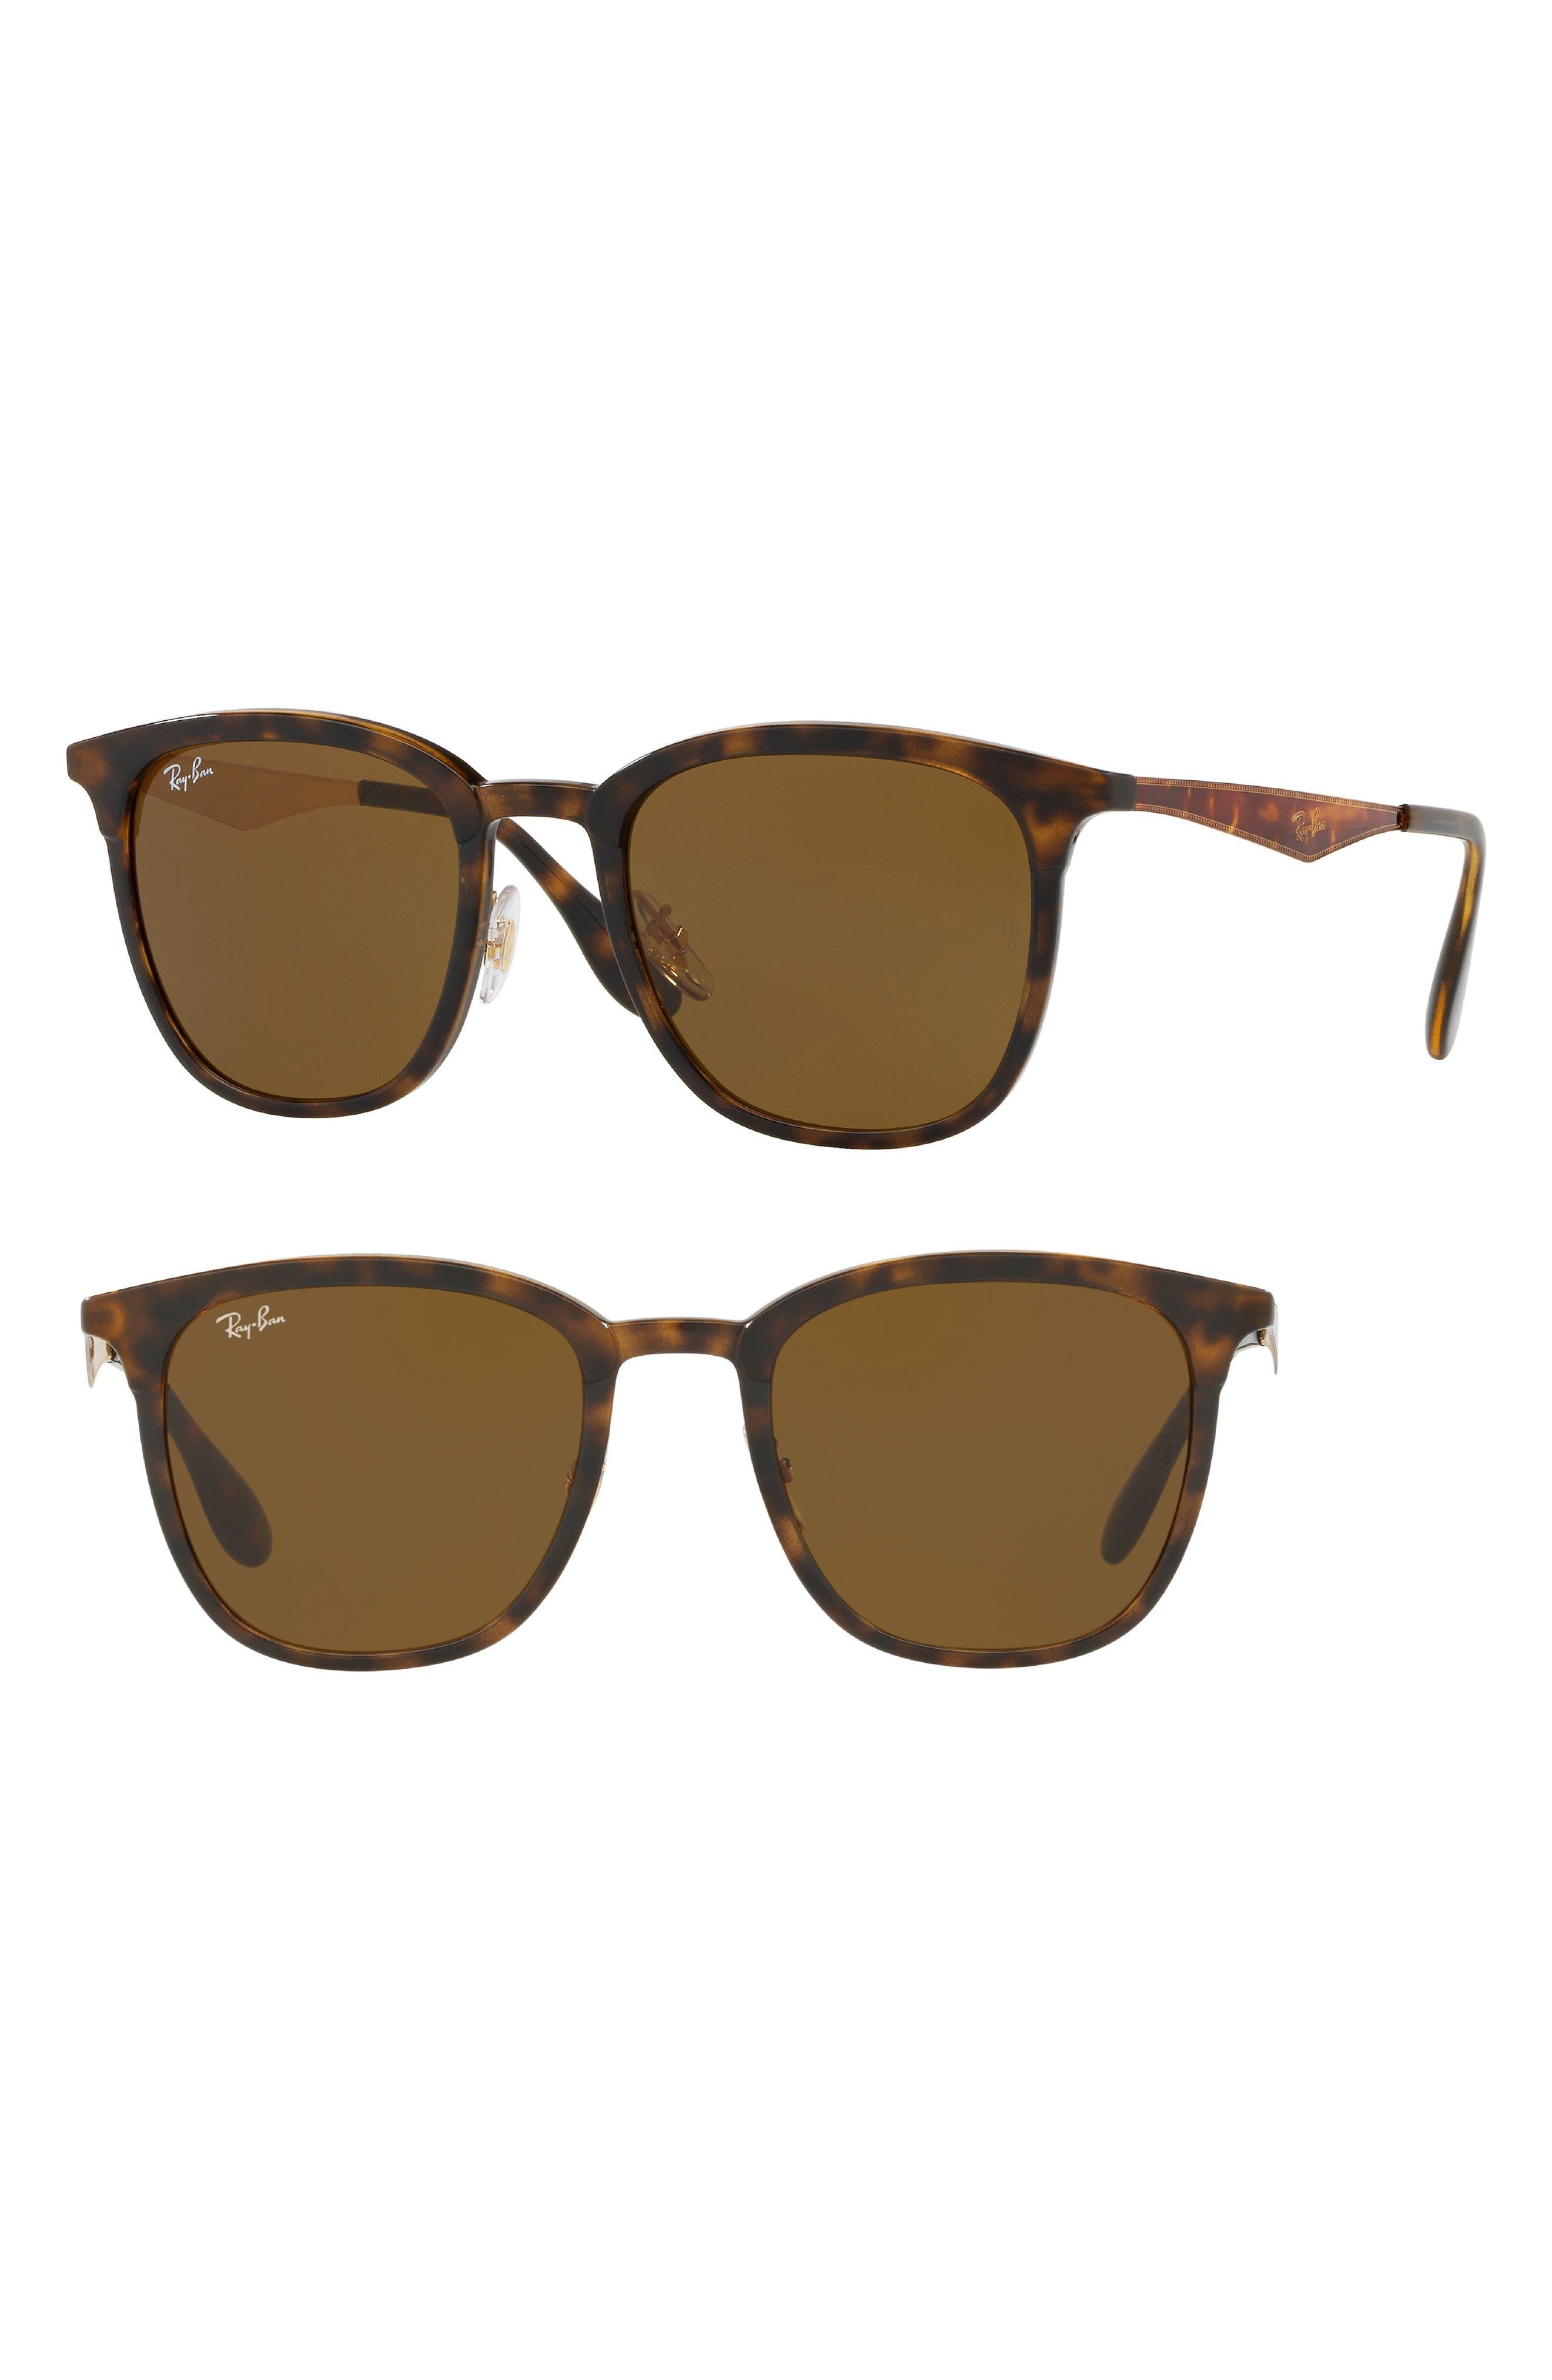 Highstreet 51mm Square Sunglasses,                             Main thumbnail 1, color,                             200